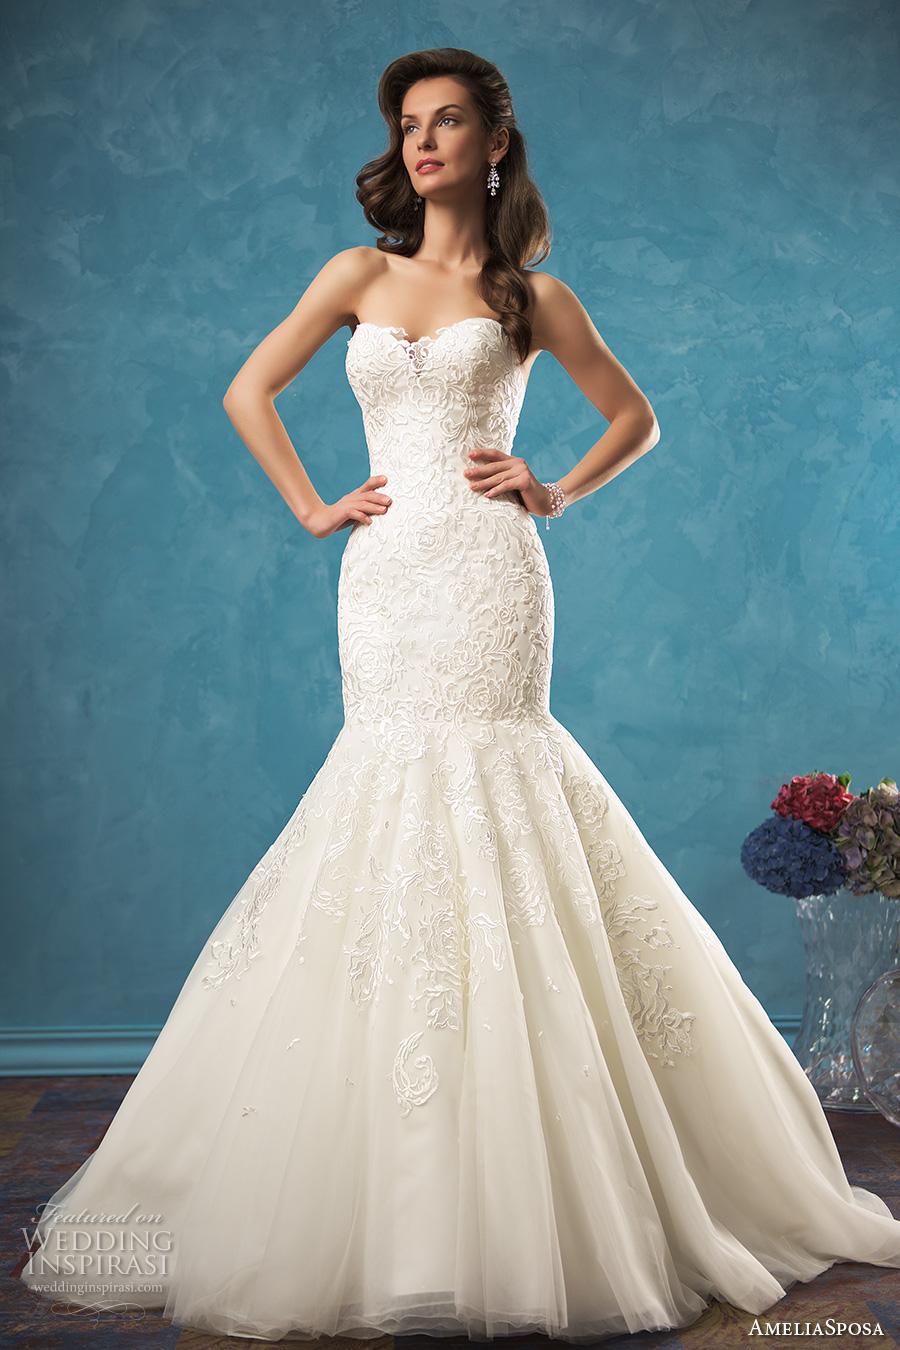 amelia sposa 2017 bridal strapless sweetheart neckline heavily embellished bodice gorgeous elegant mermaid wedding dress low back cathedral train (alina) mv